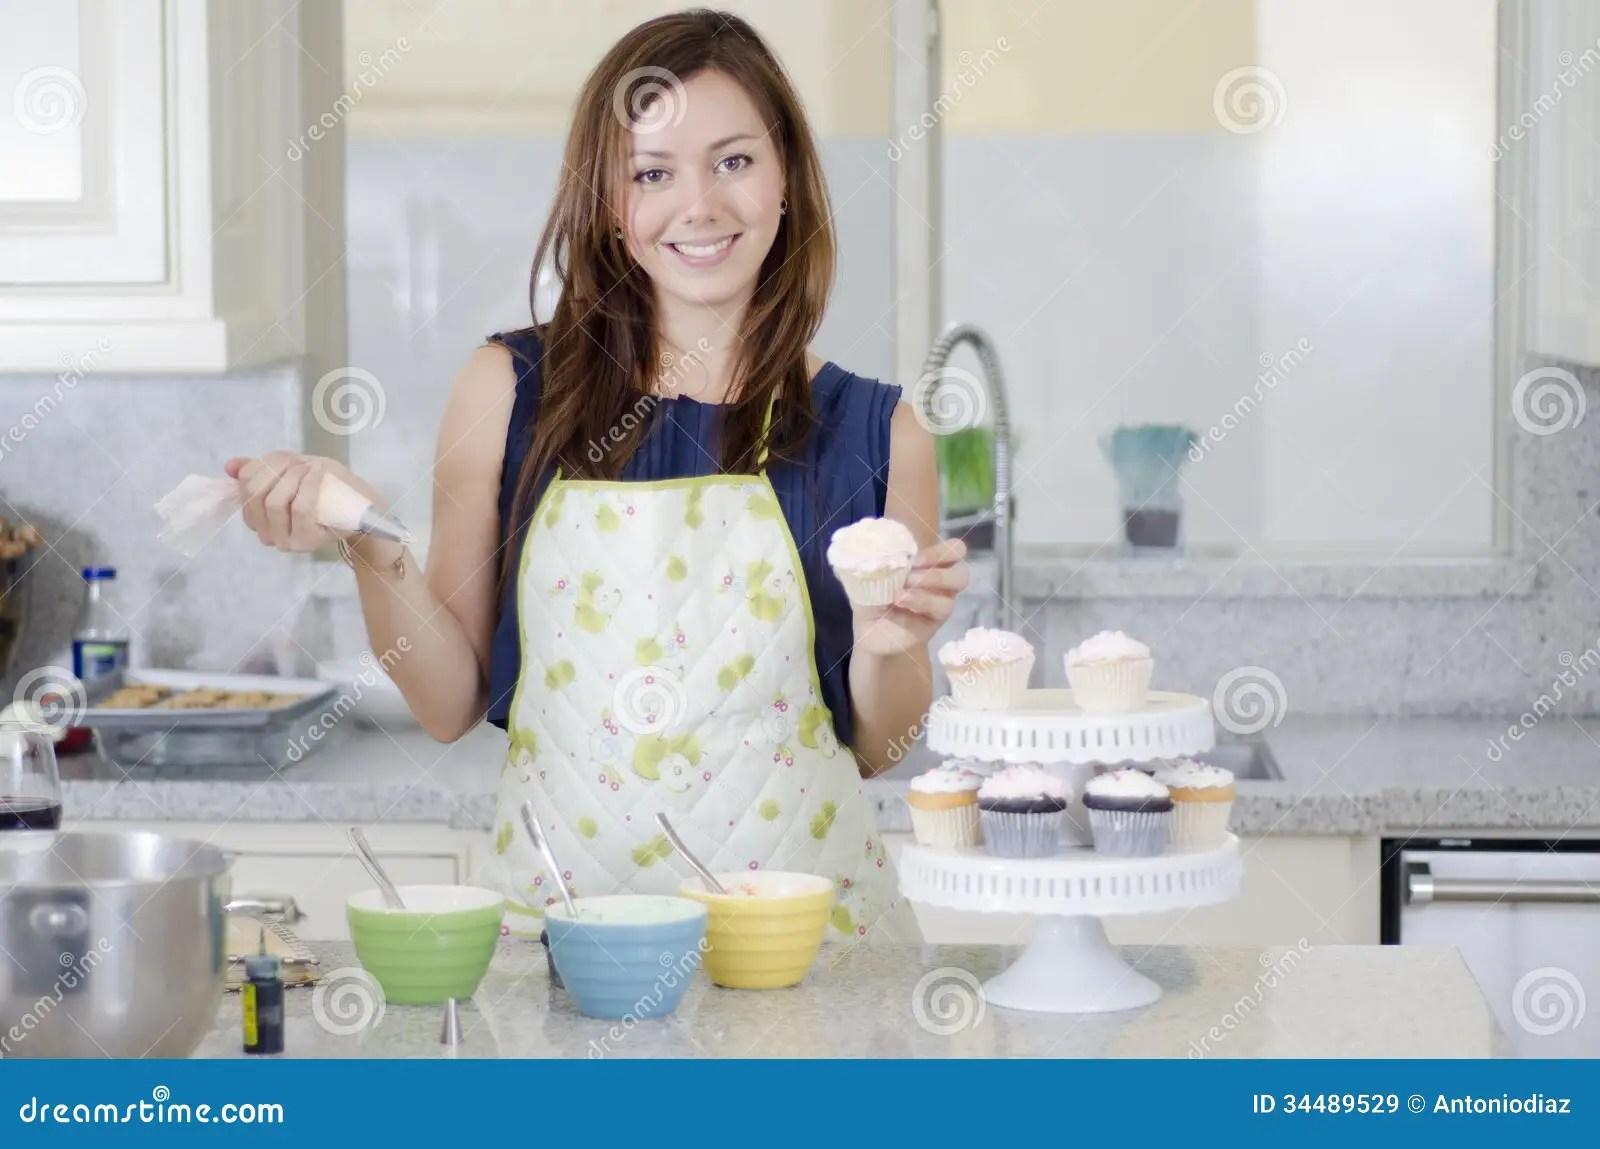 Beautiful Woman Making Cupcakes Royalty Free Stock Images